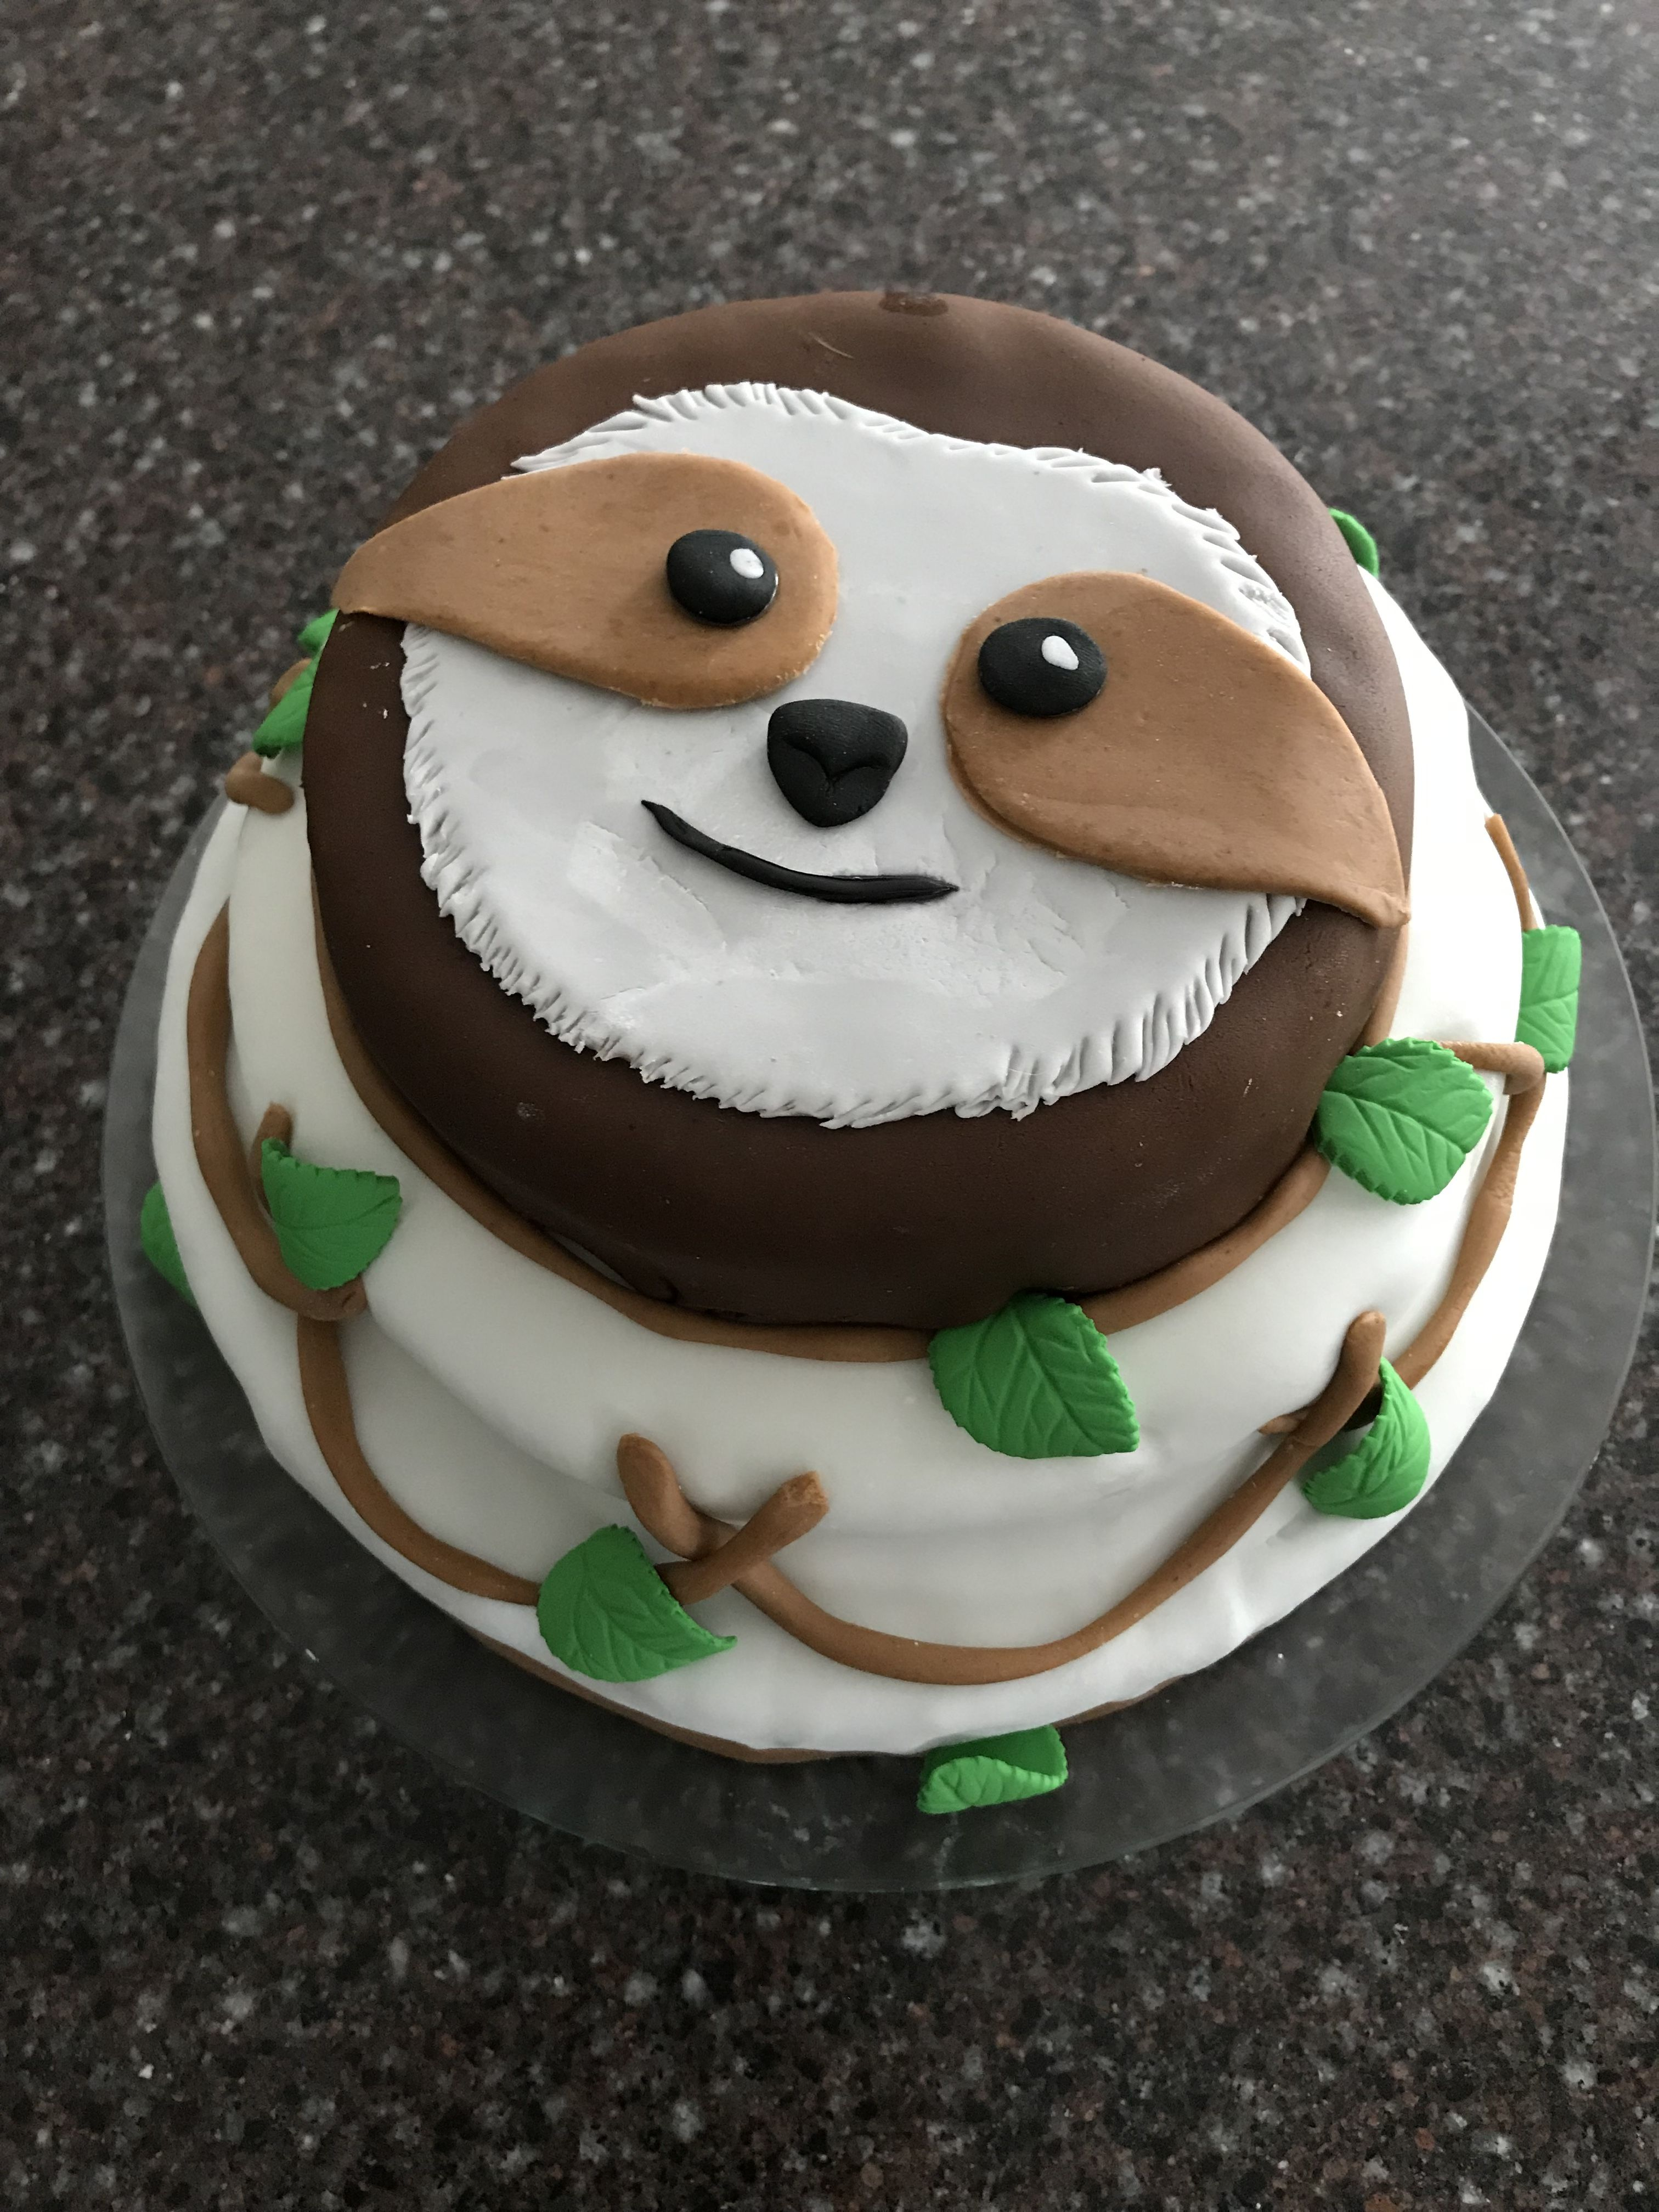 Sloth cake in fondant | Sloth | Cake, Sloth cakes, Animal cakes